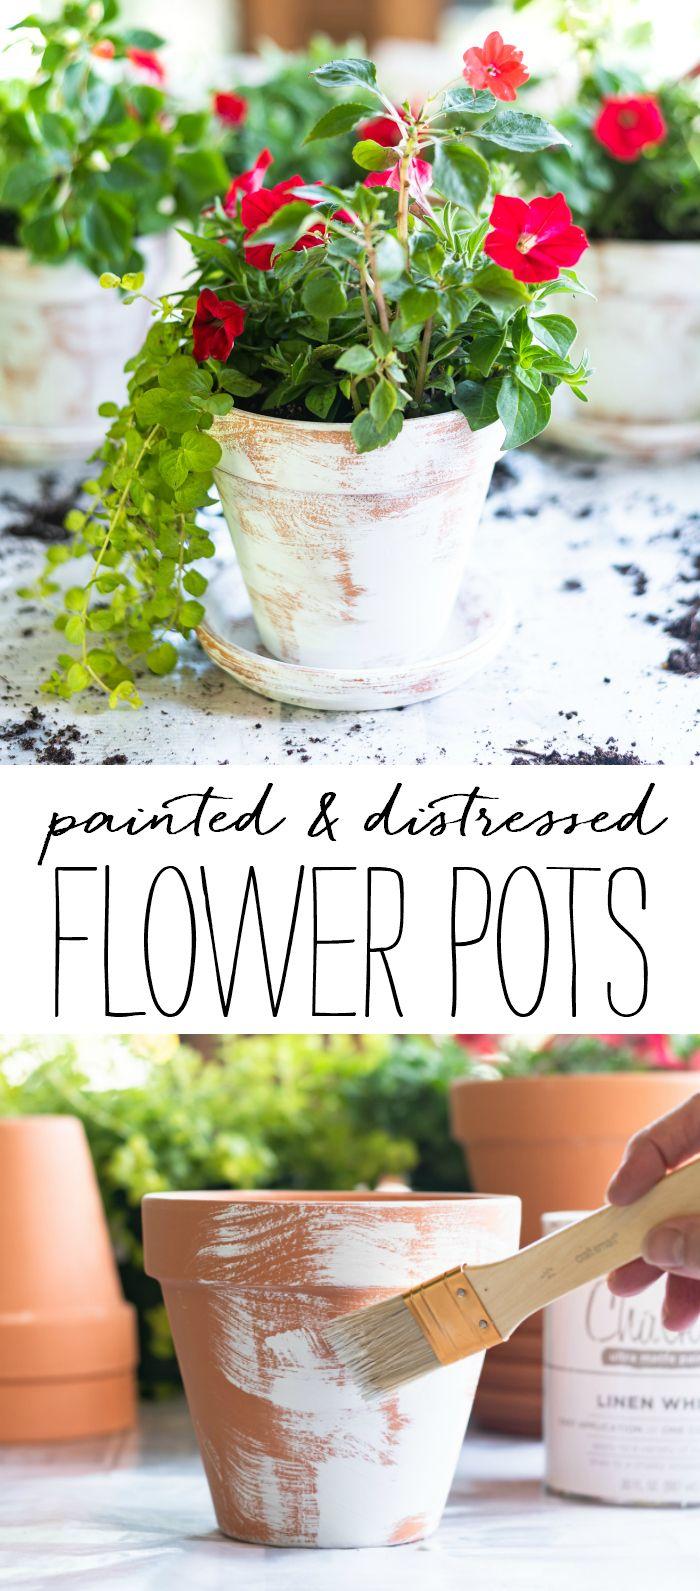 Easy Distressed Terracotta Pots Terracotta Flower Pots Flower Pots Terracotta Pots